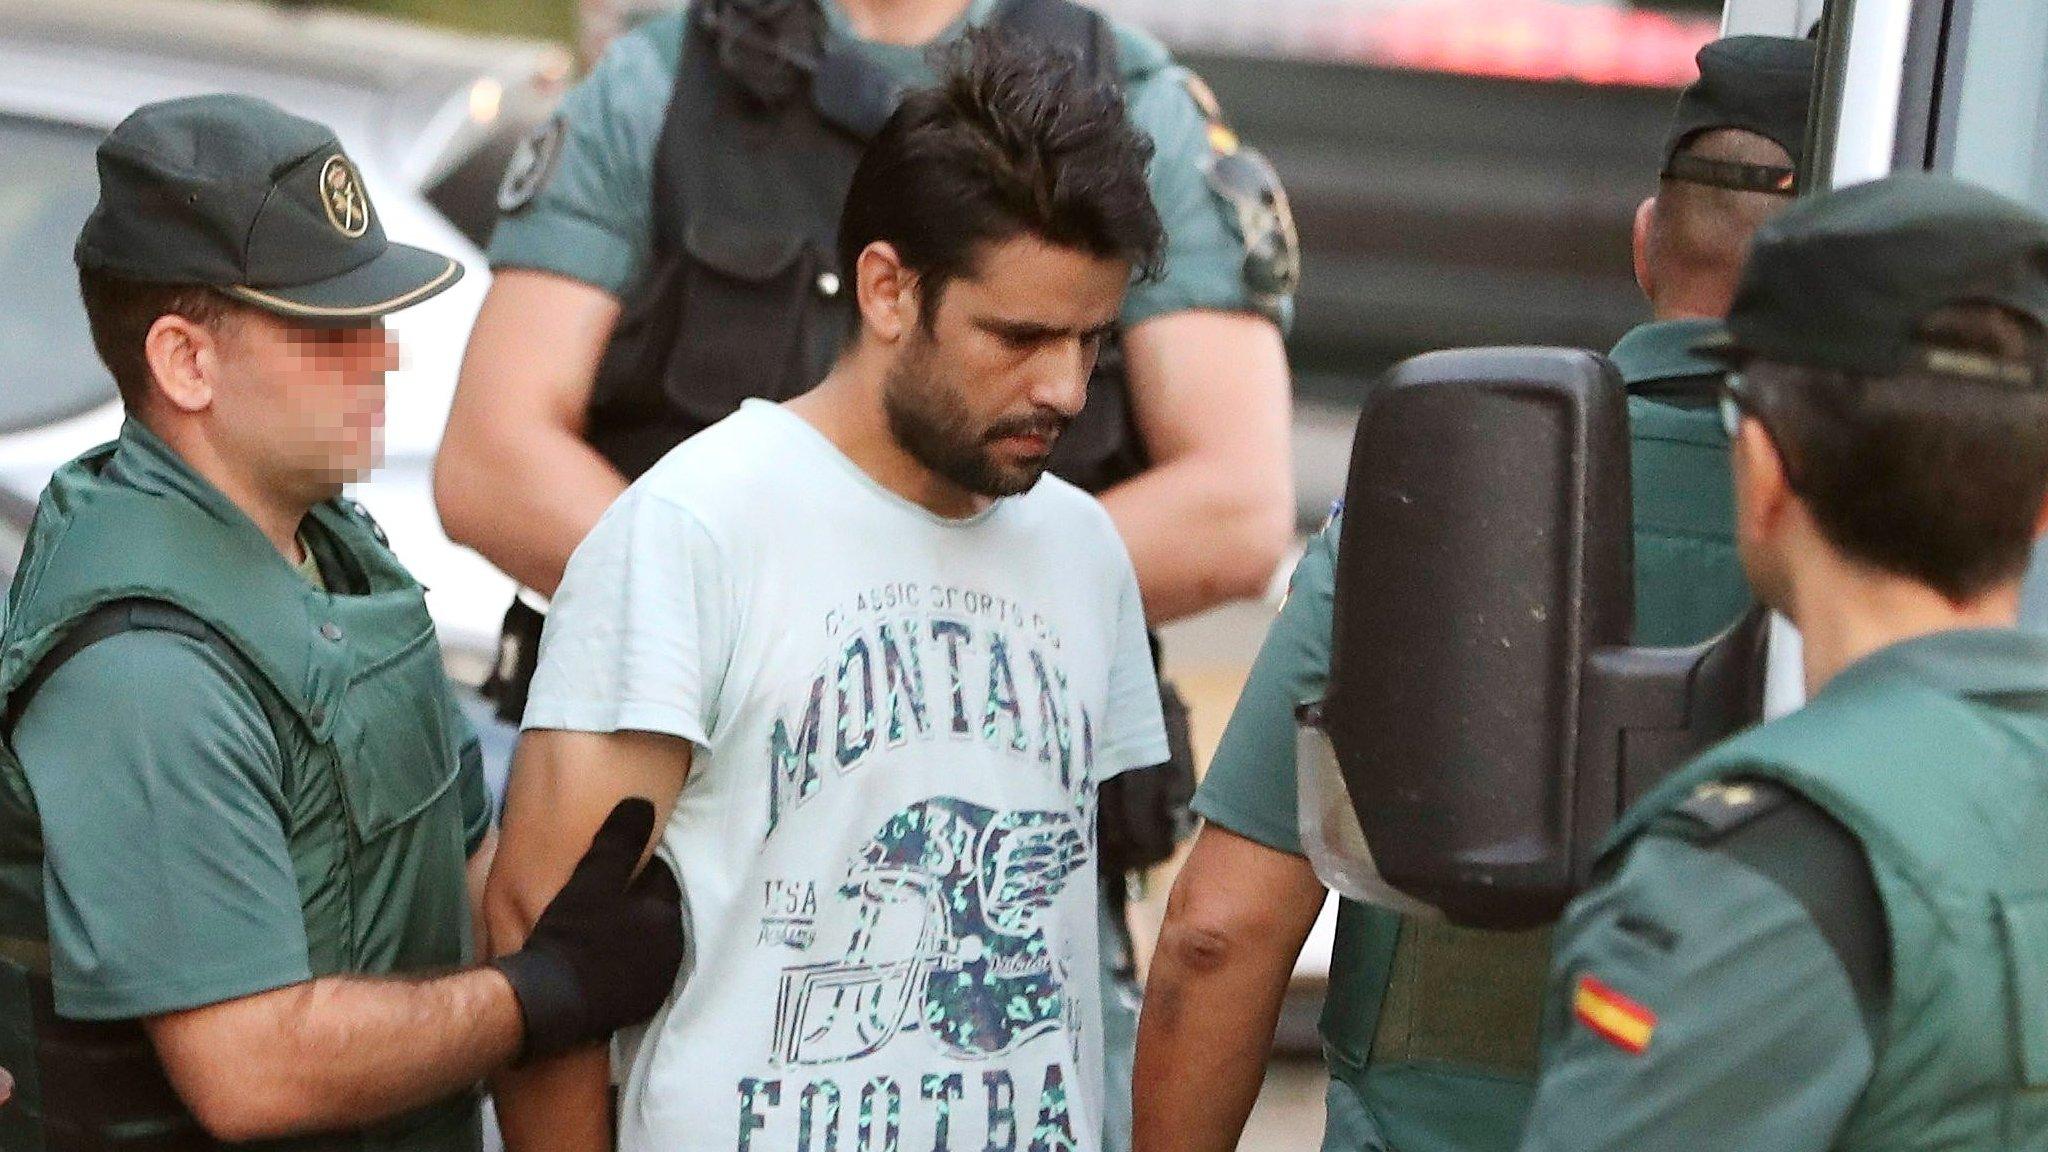 Barcelona attack: Surviving suspects face judge